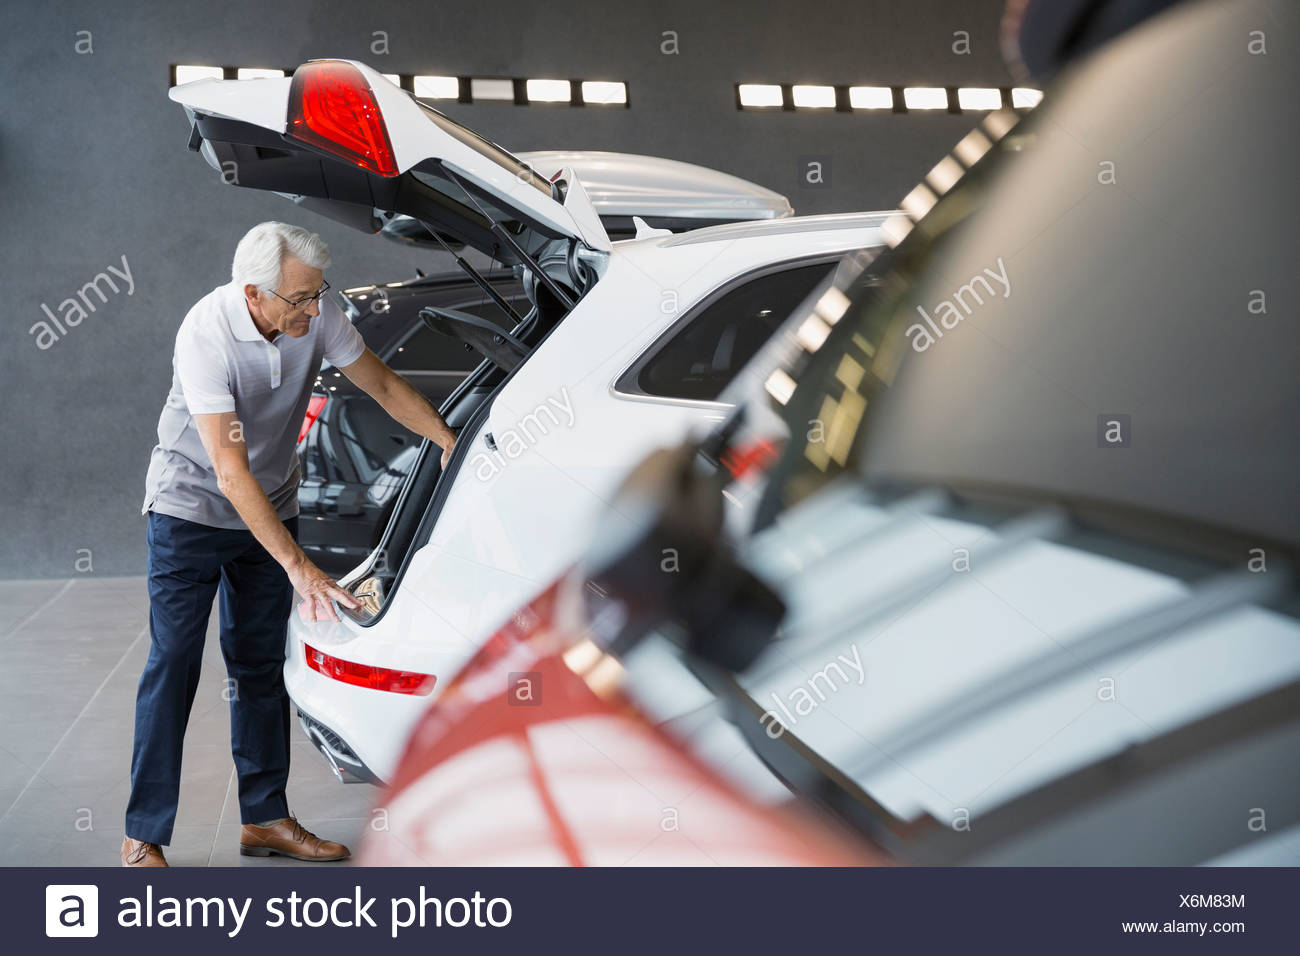 Man looking inside car in car dealership showroom Stock Photo